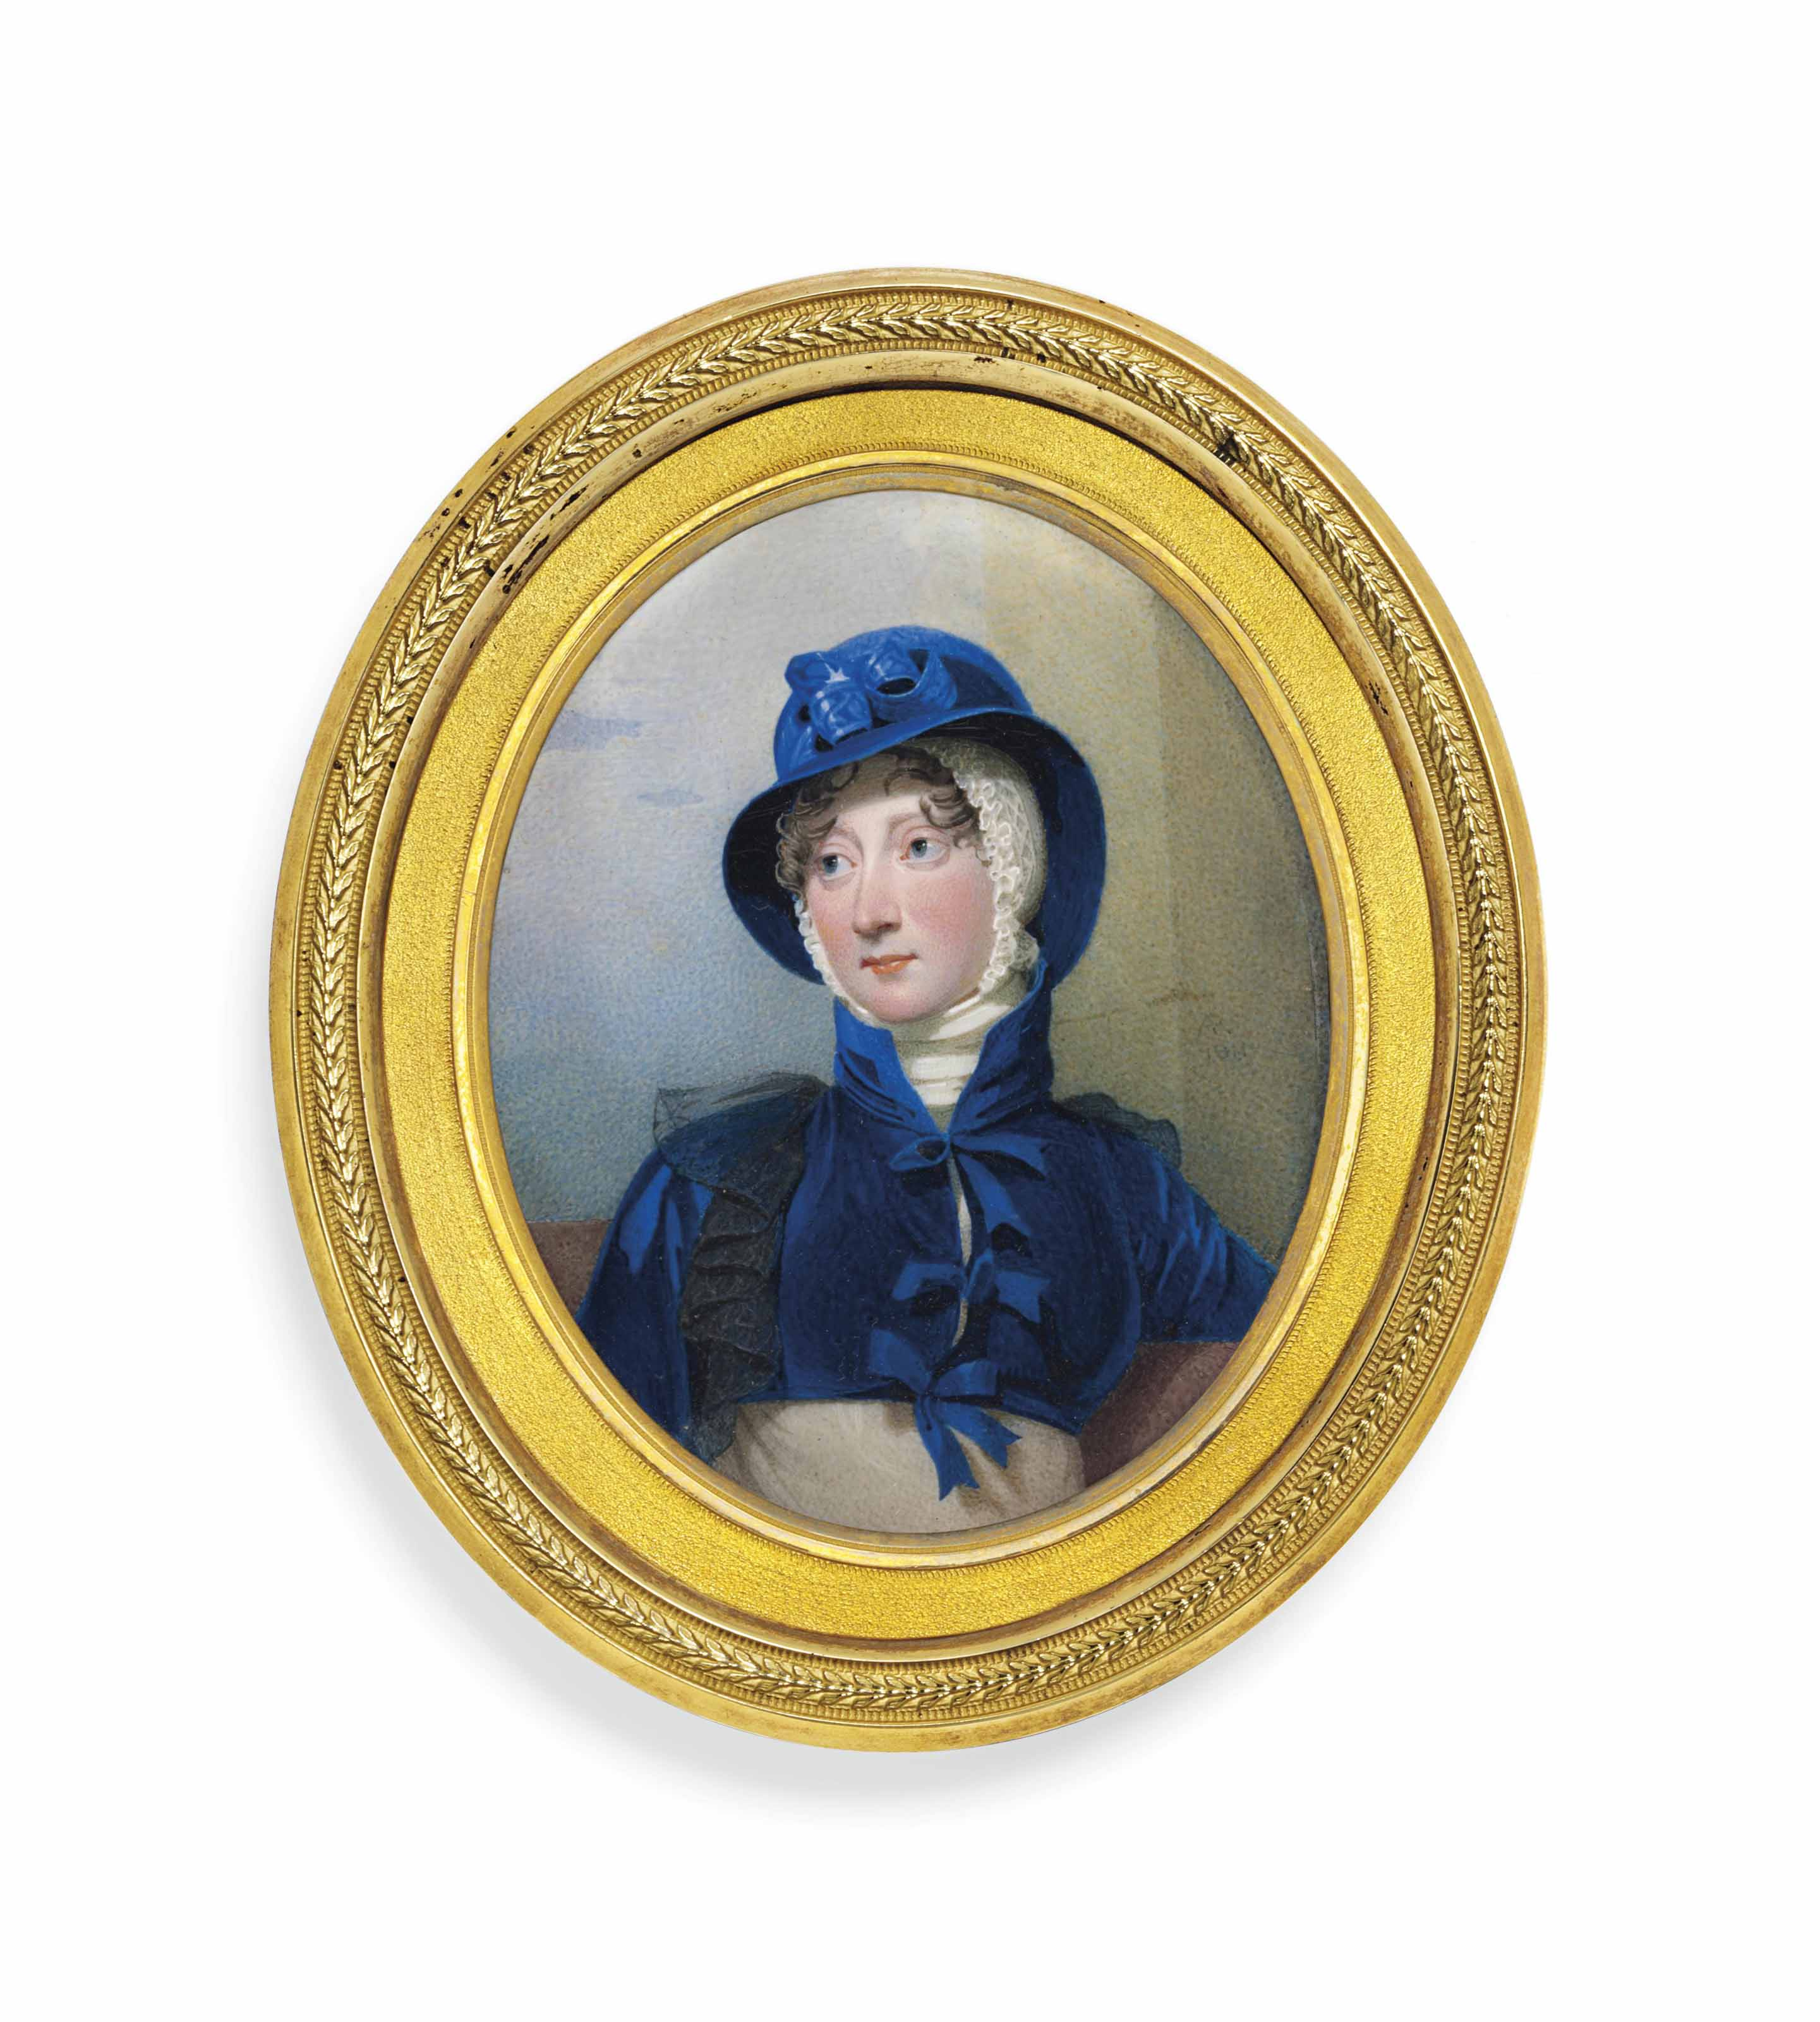 ANDREW ROBERTSON (SCOTTISH, 1777-1845)